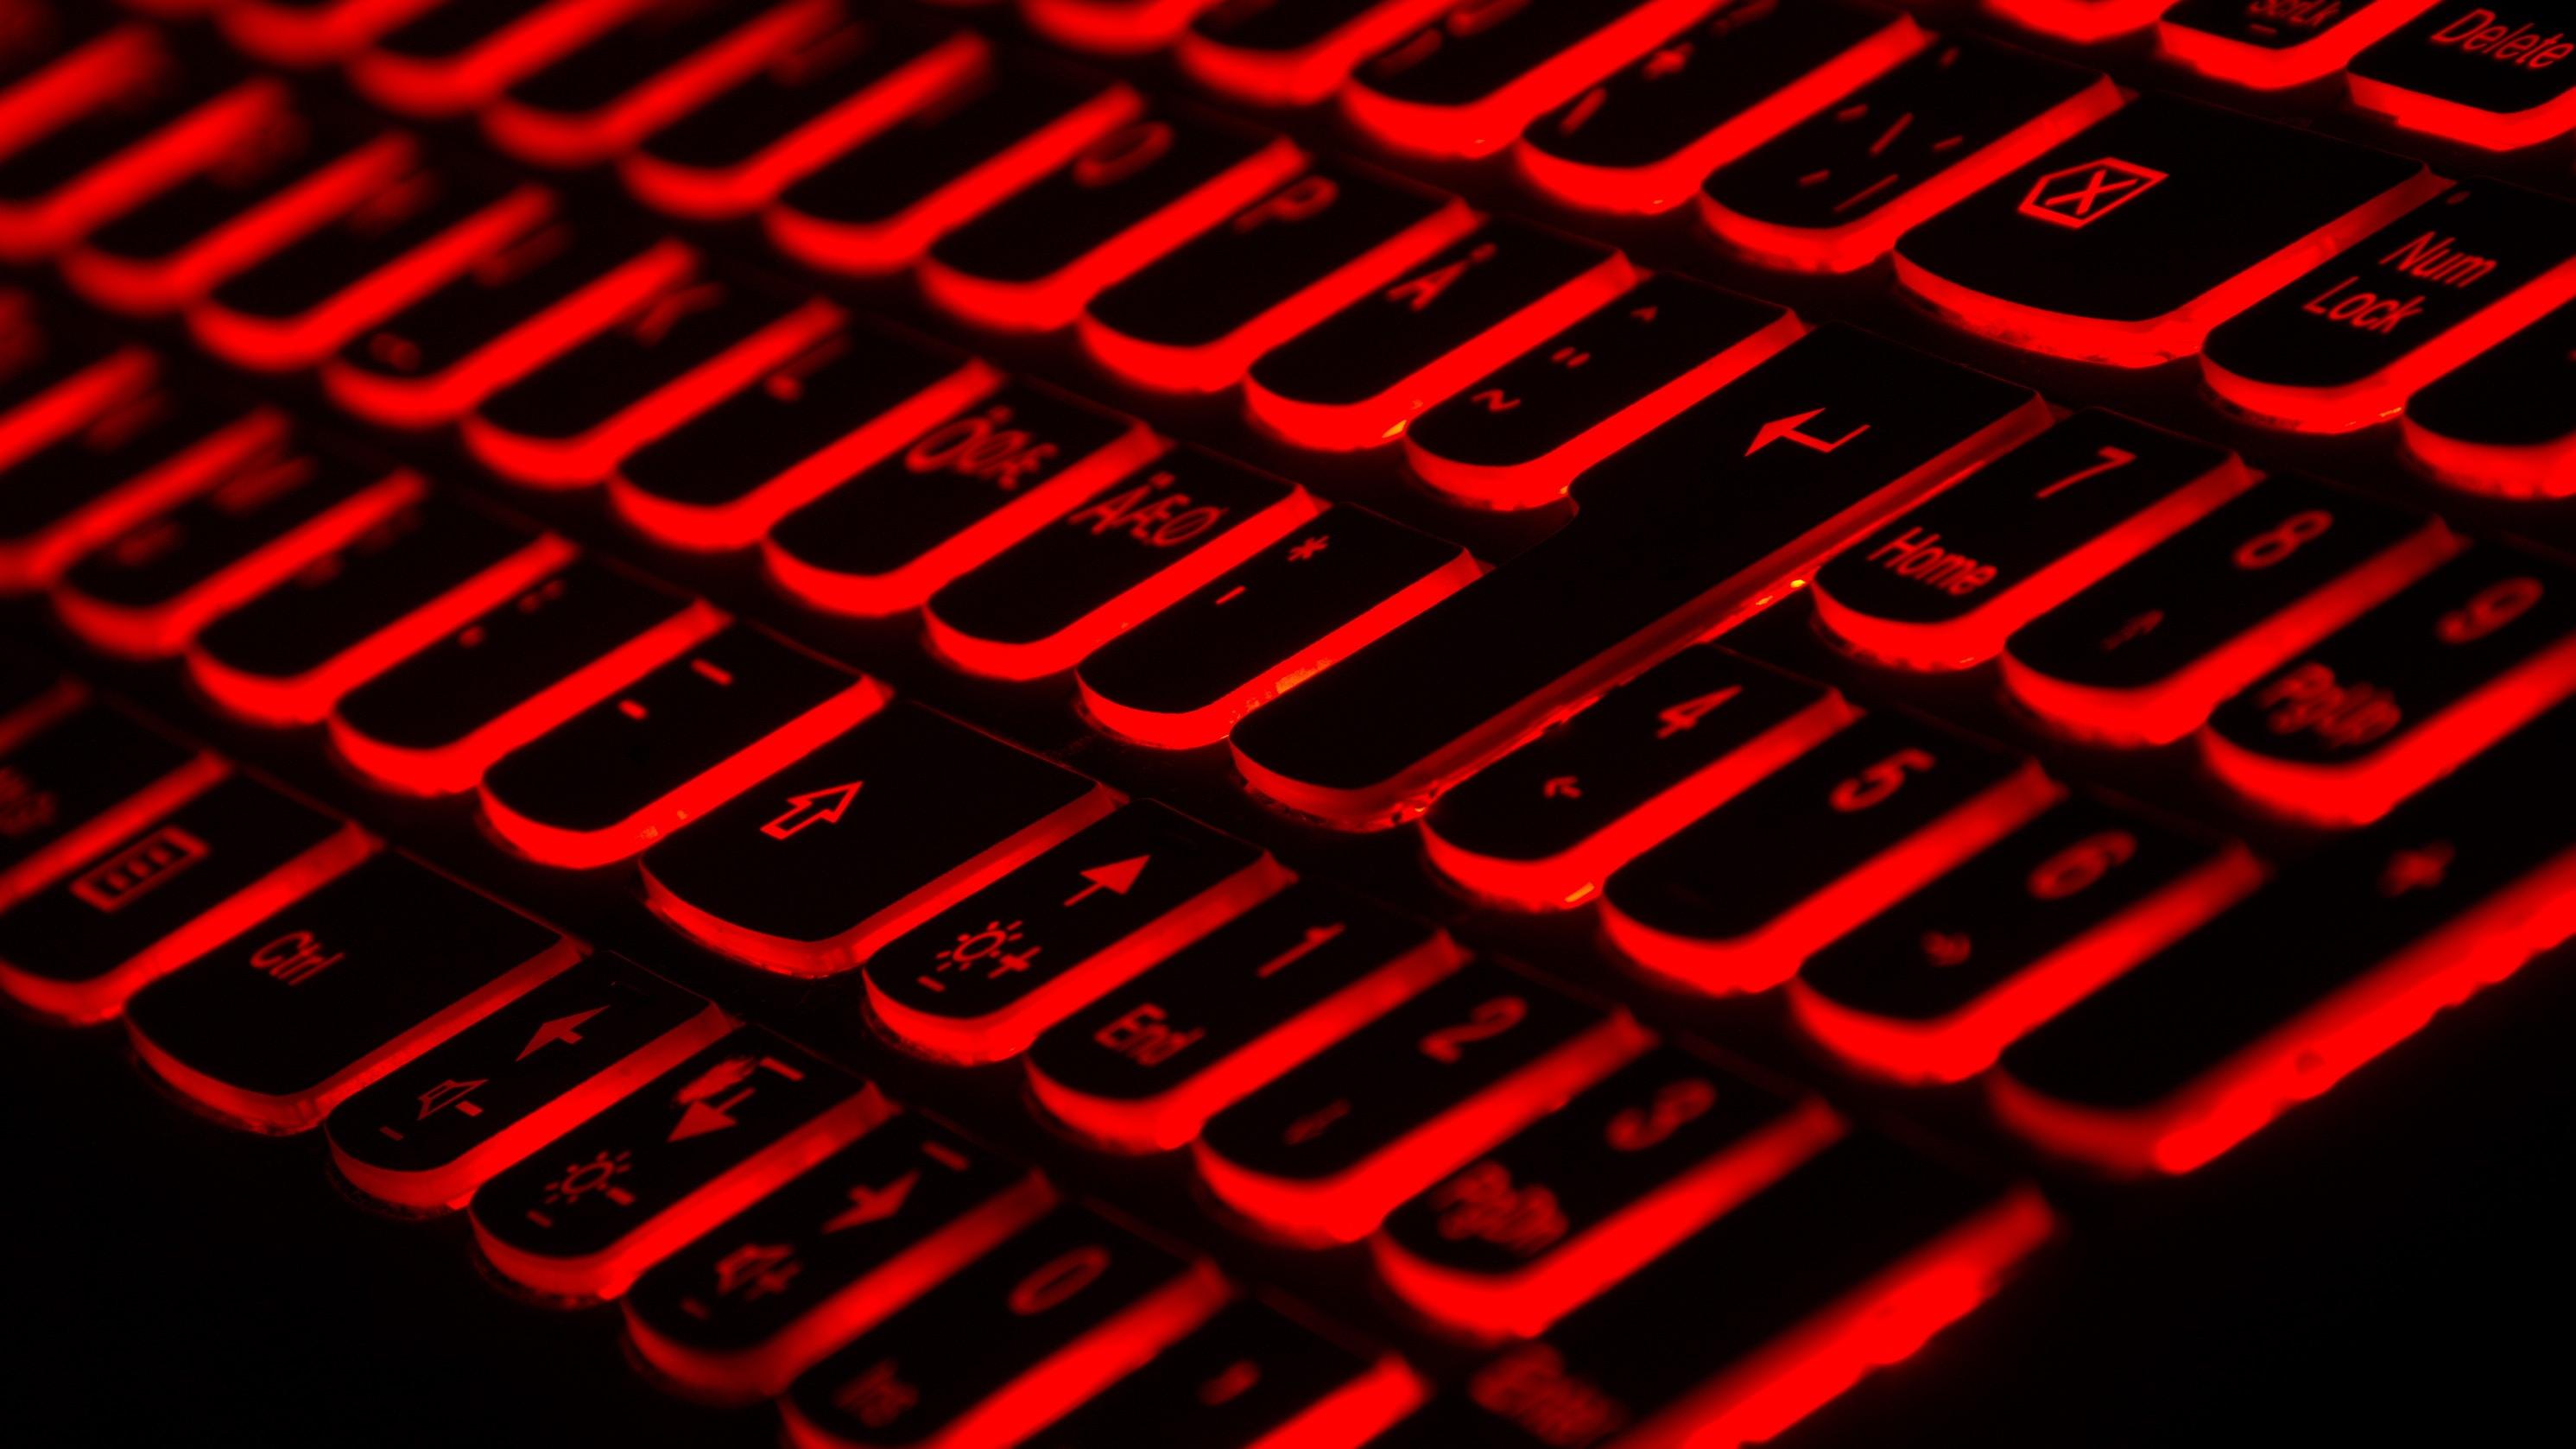 Red keyboard, Photo by Taskin Ashiq on Unsplash